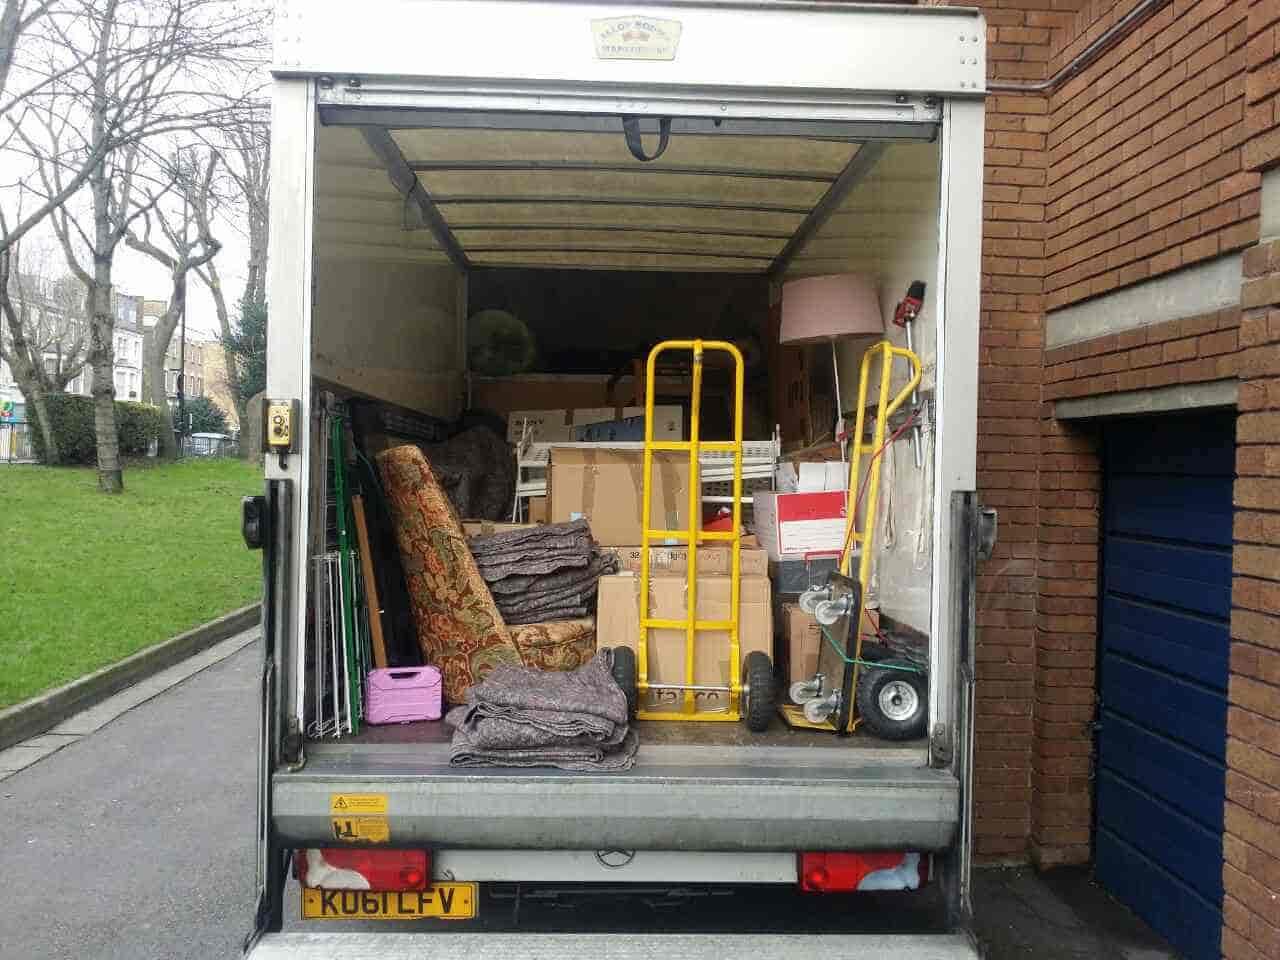 UB10 van for hire in Ickenham